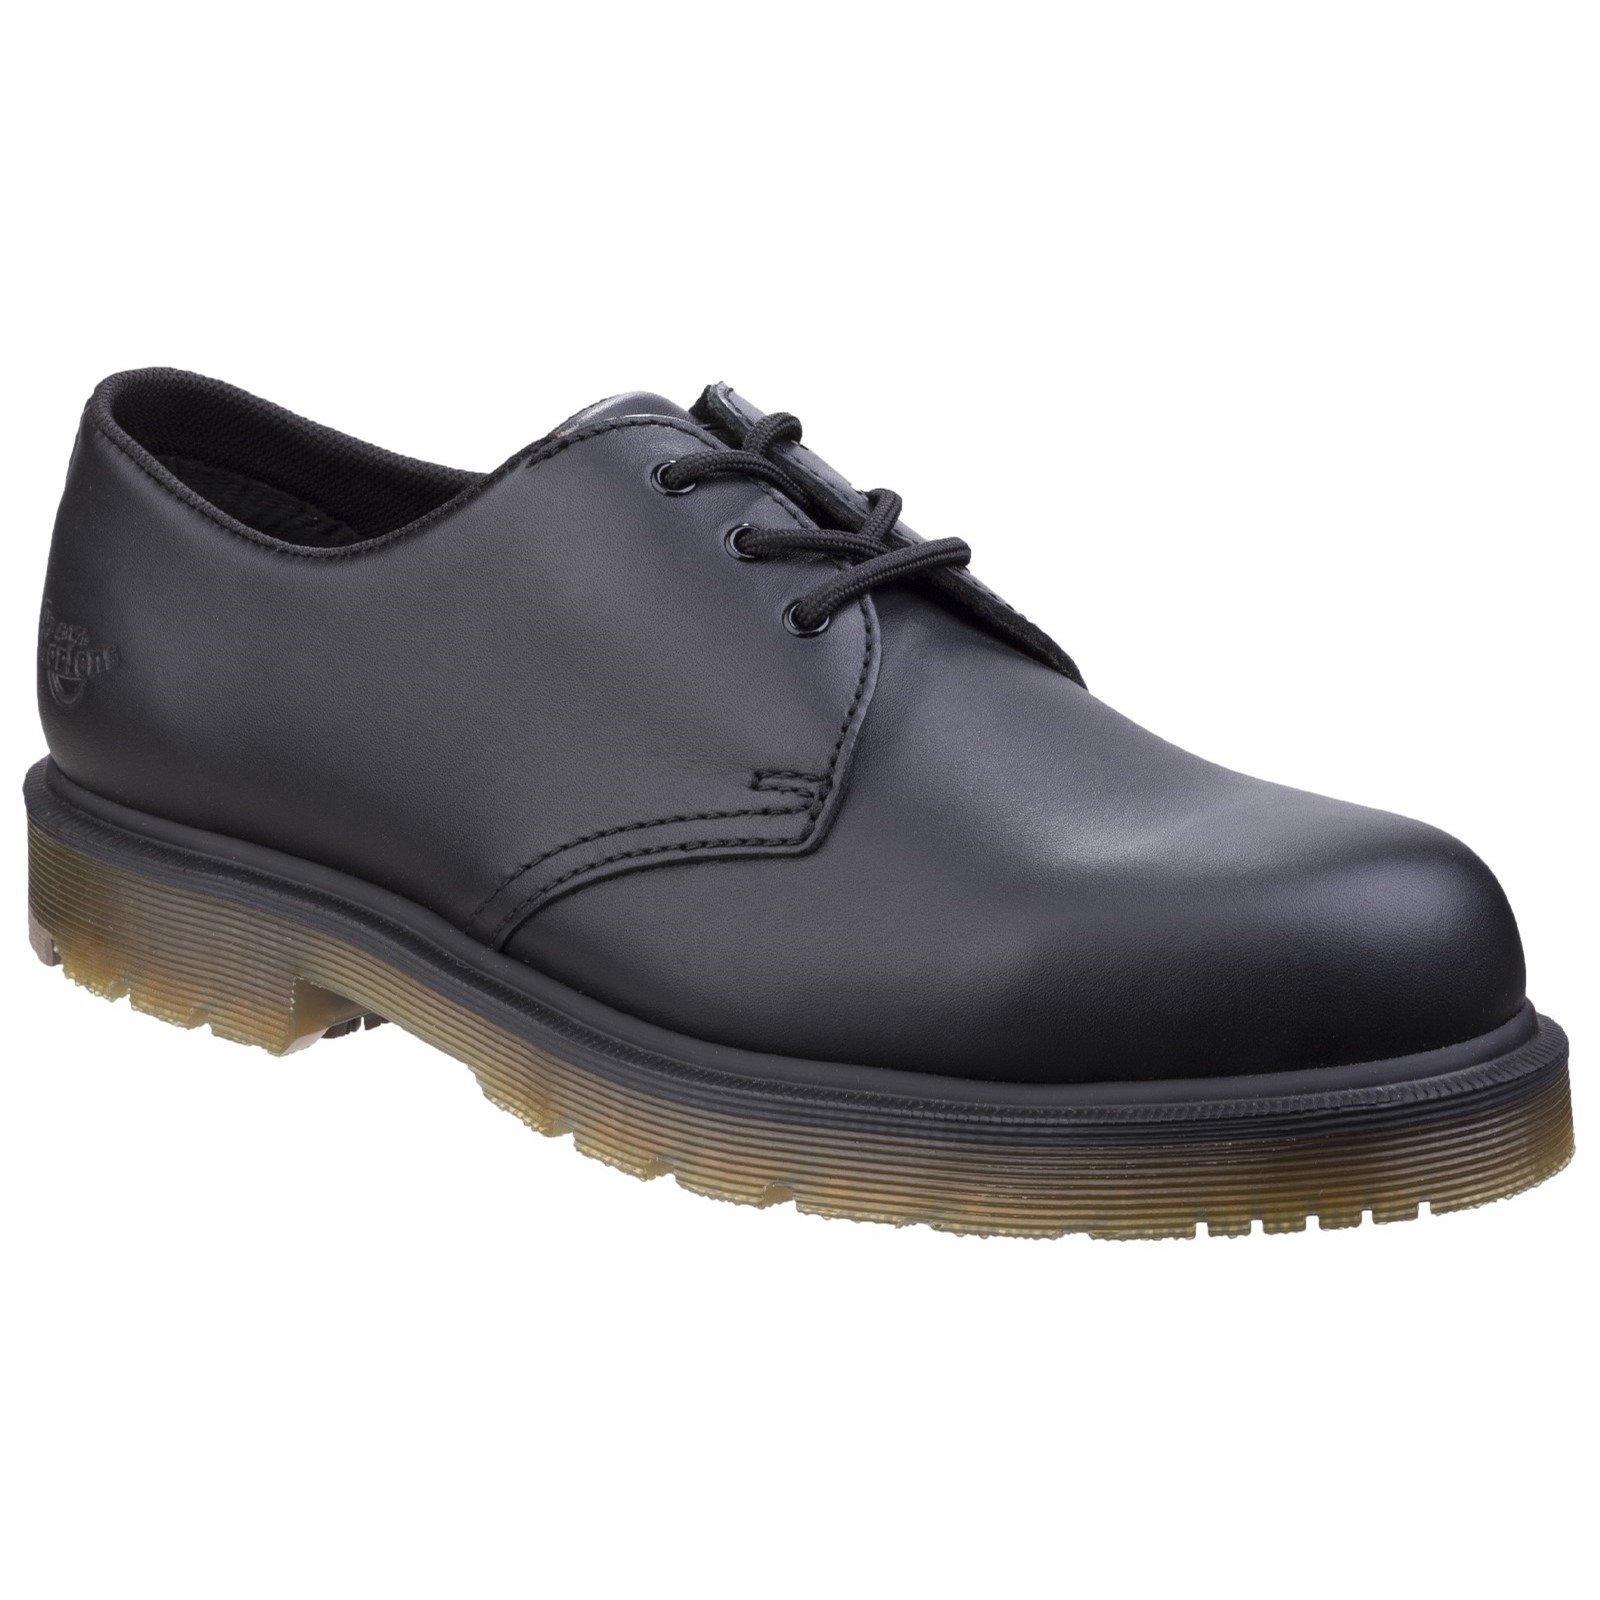 Dr Martens Men's Arlington NS Derby Shoe Black 26781 - Black Industrial Full Grain 11